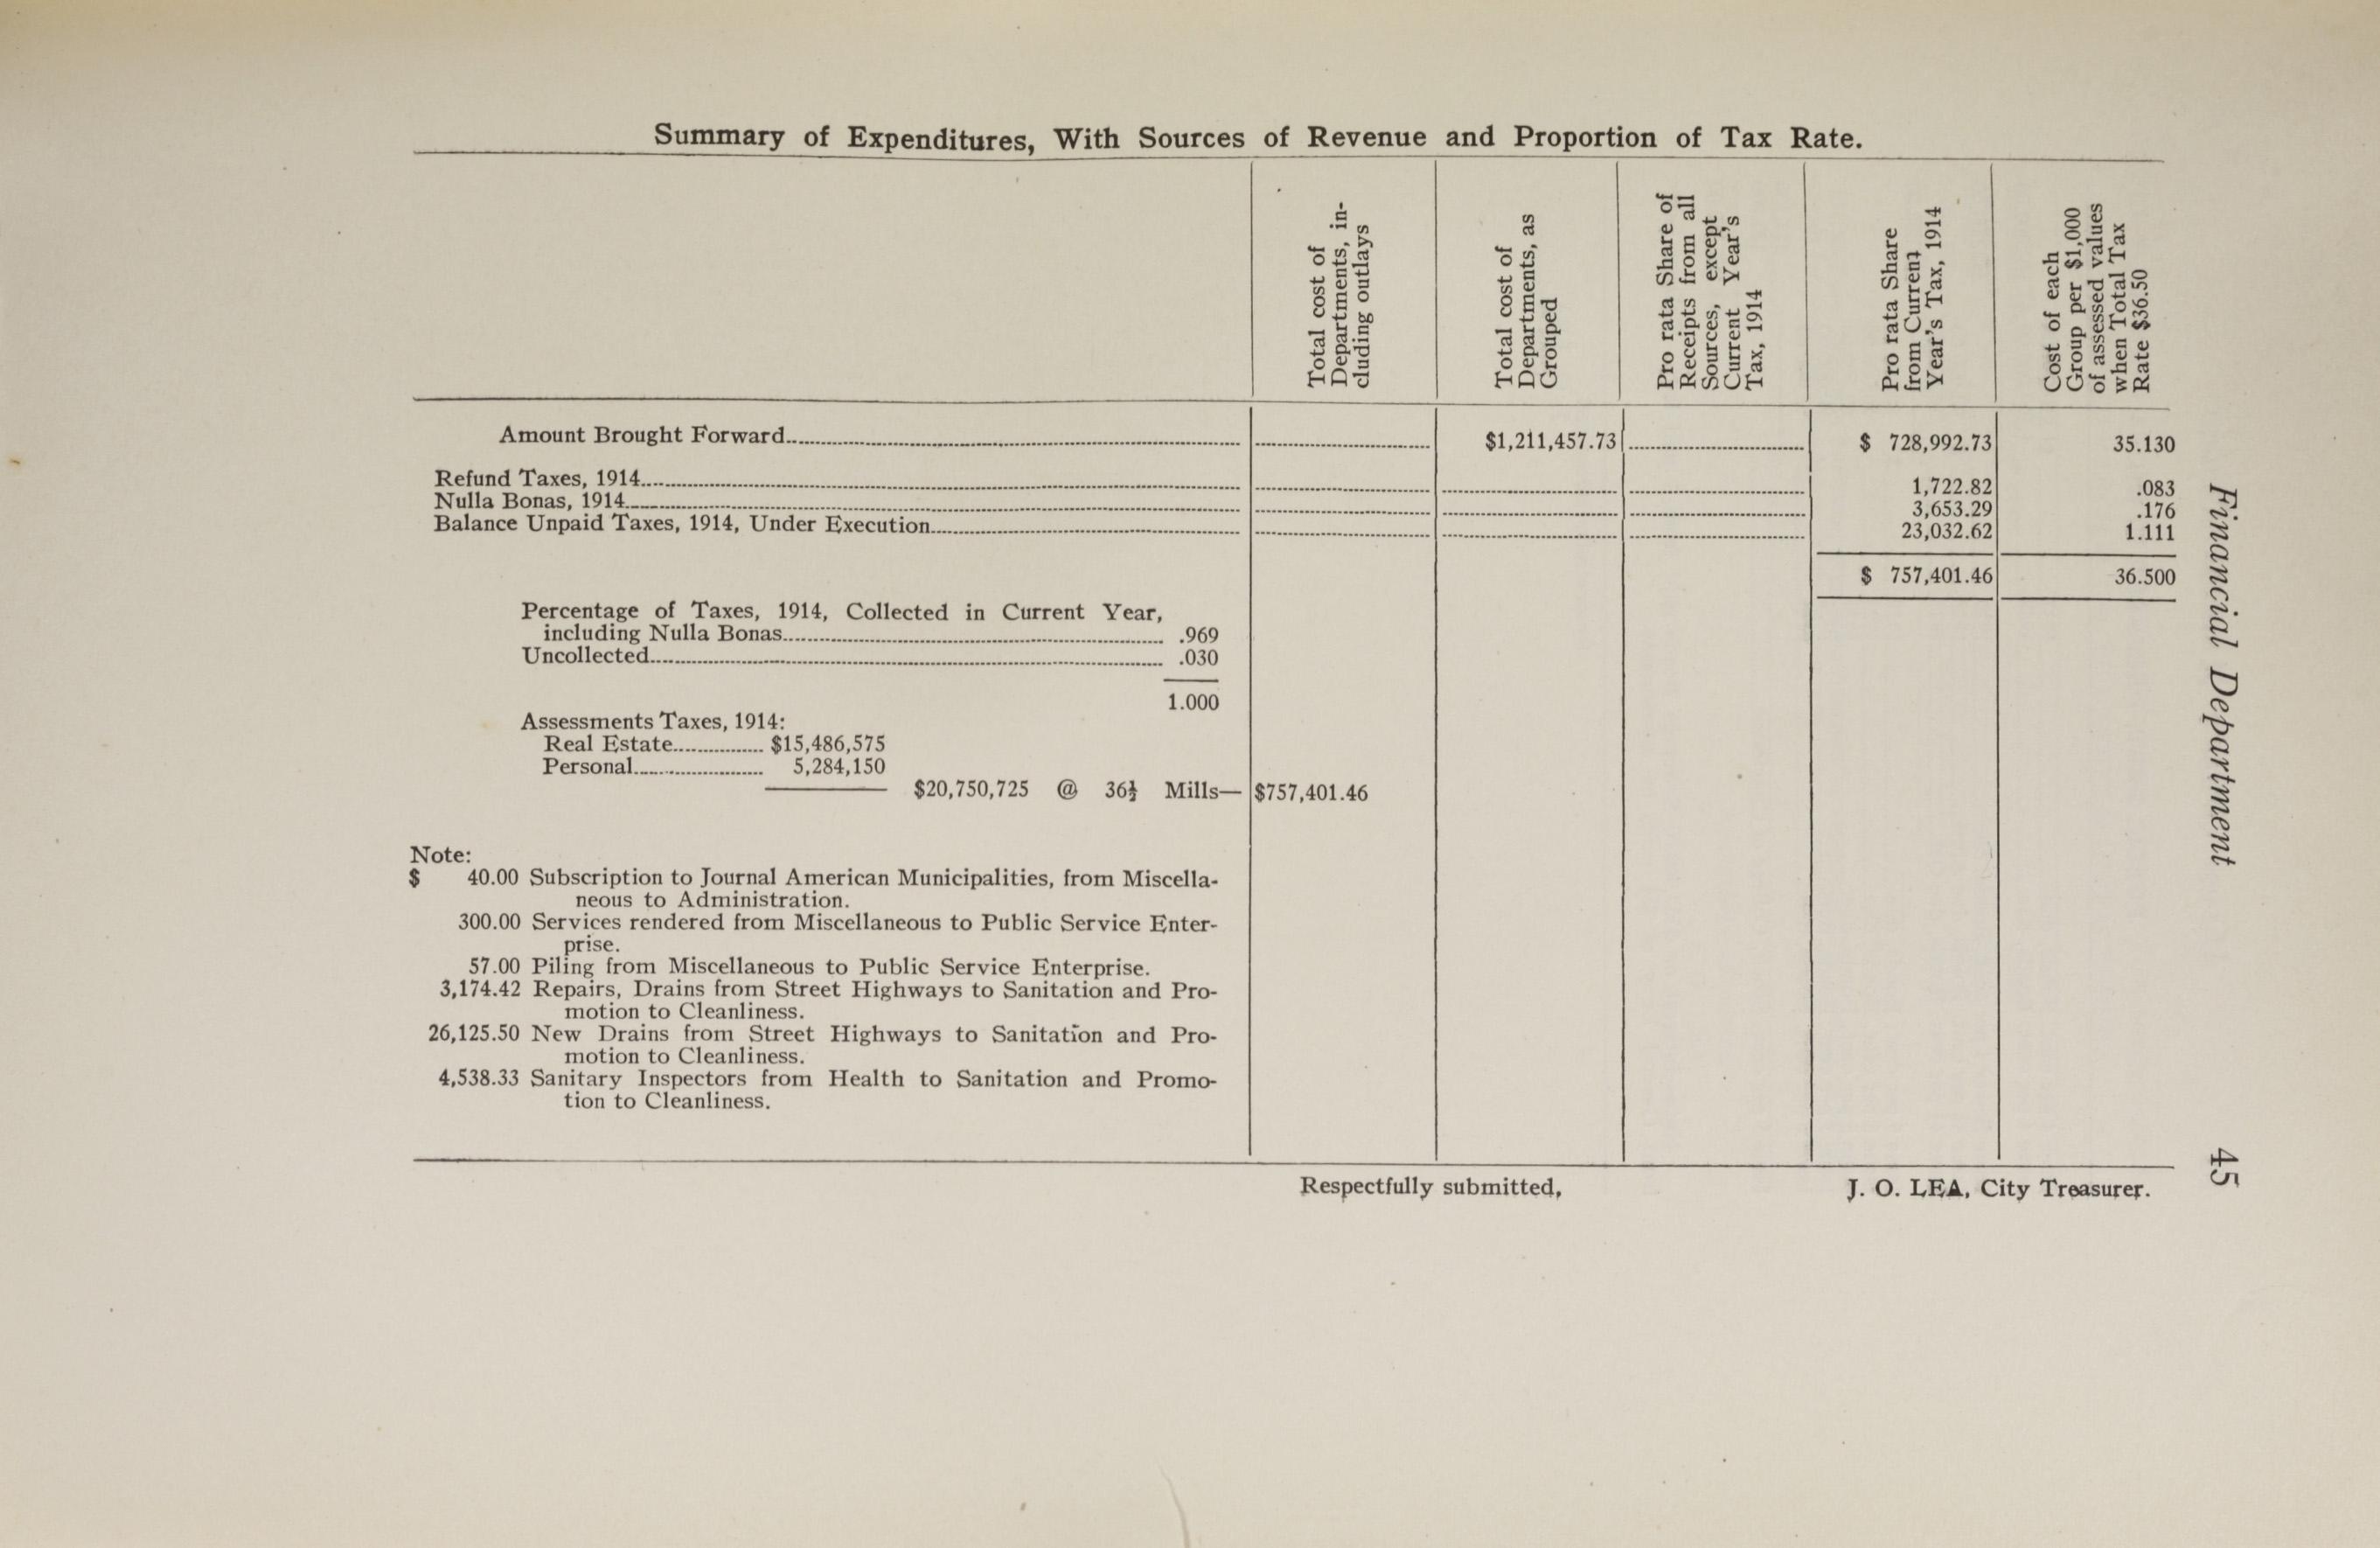 Charleston Yearbook, 1914, page 45